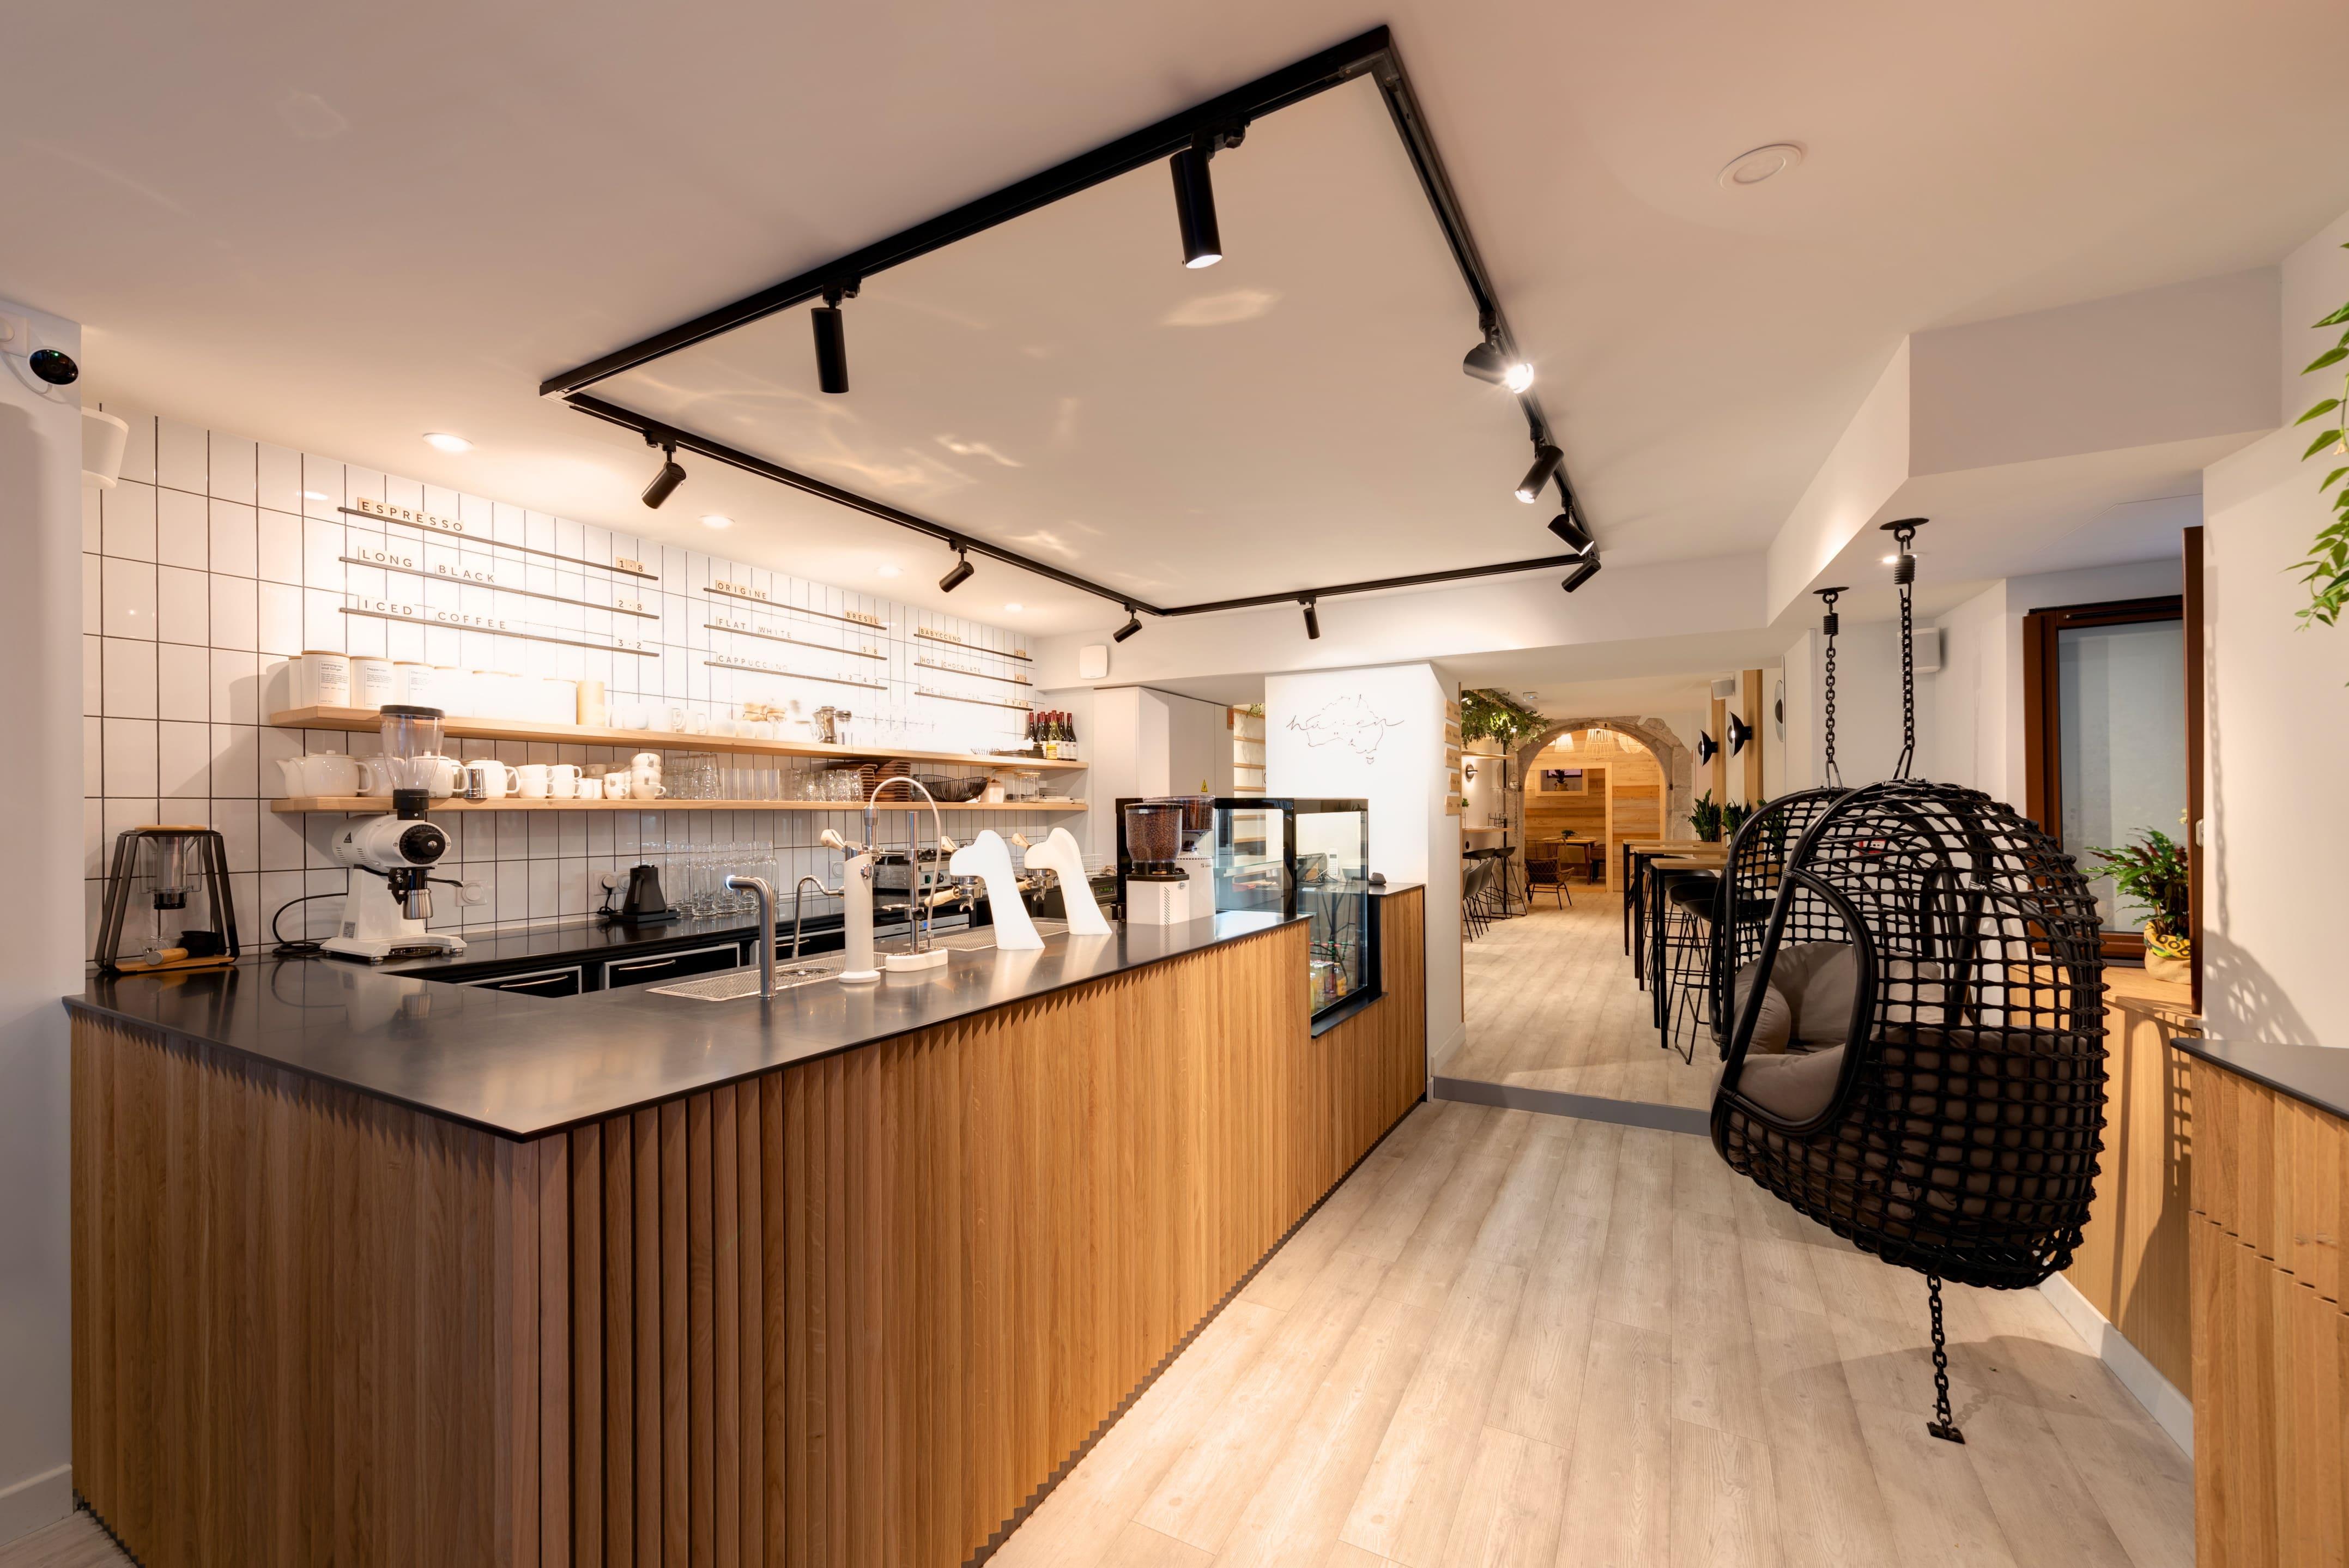 Agencement interieur design métallique ROBI restaurant Haven Annecy 74 agencement en metal 5